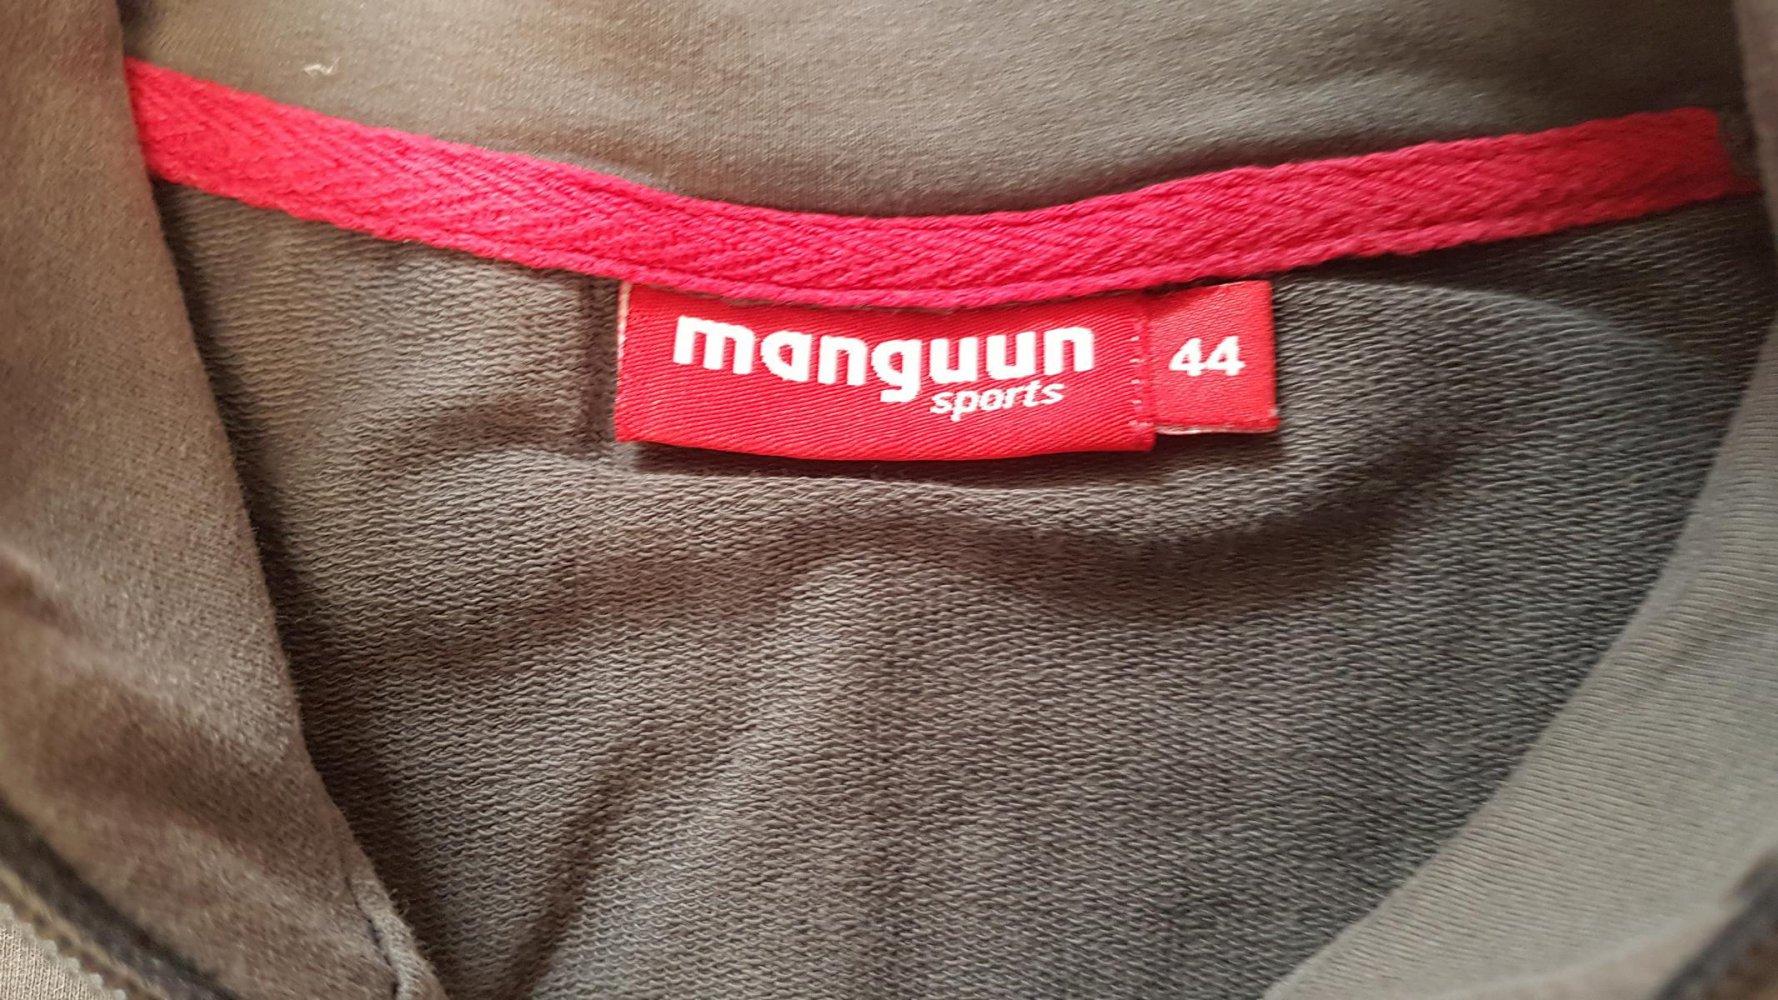 Manguun Jacke, Strickjacke, Pullover 44 L wie neu